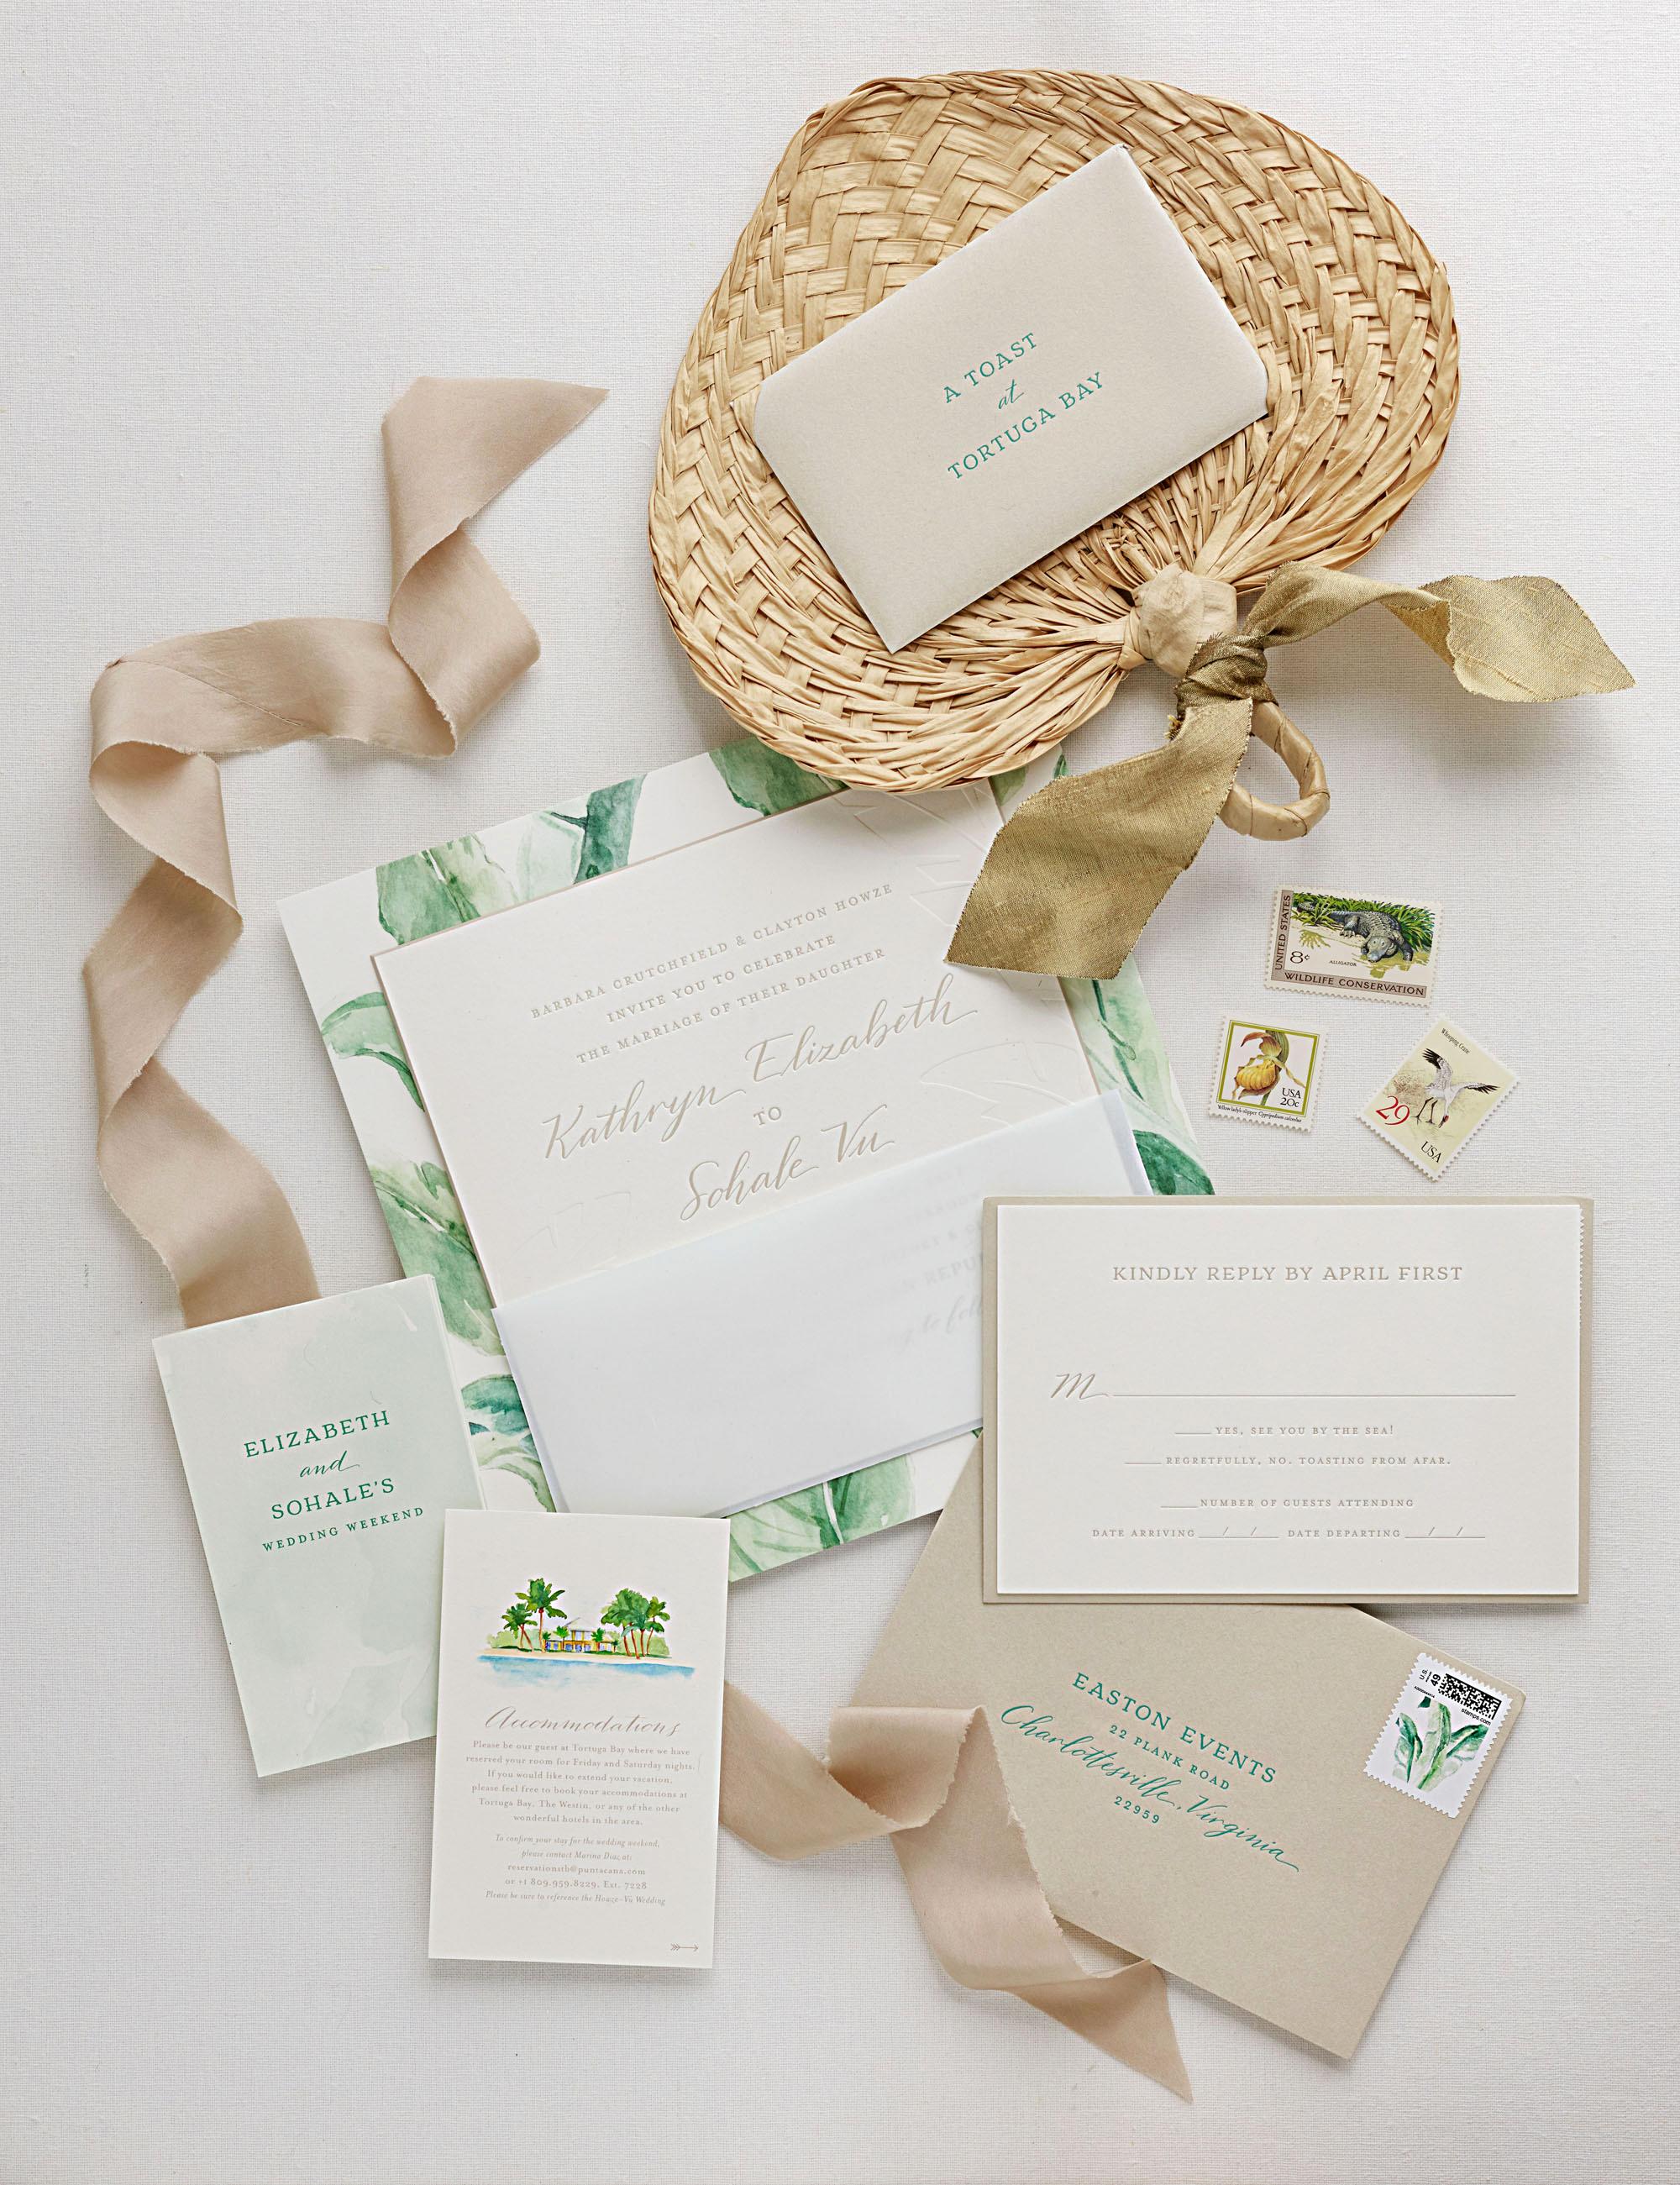 elizabeth sohale wedding dominican republic invitation suite